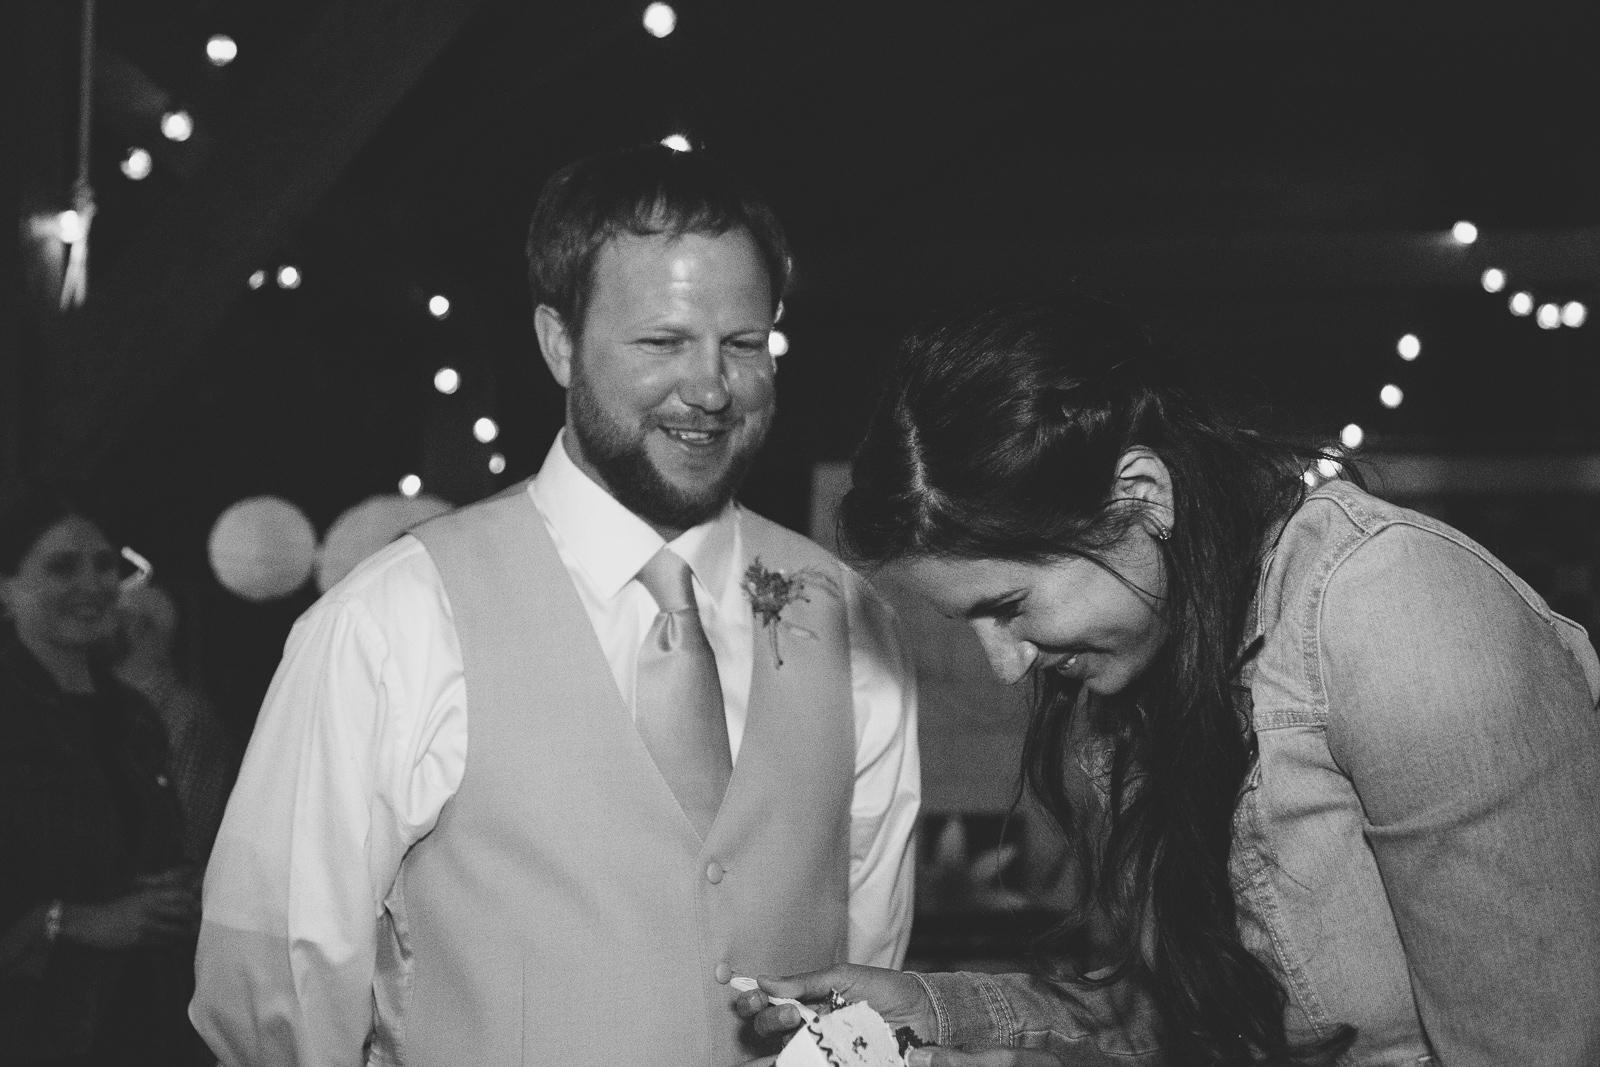 187-wedding-fun-photography-reception-unique-nature-trees-dancing